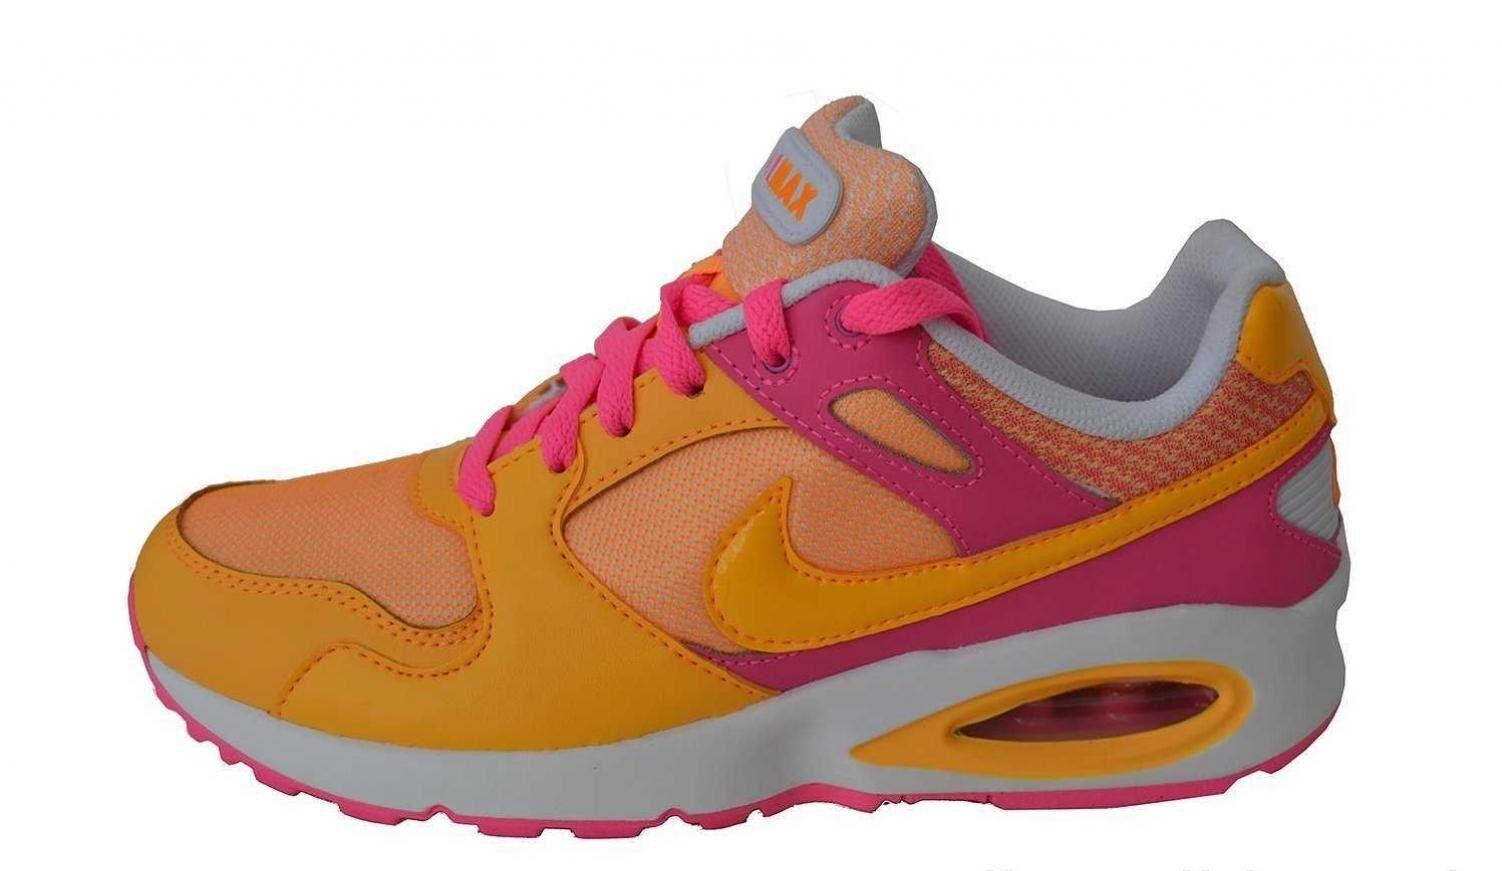 BNIB Femme Nike Coliseum Air Max Coliseum Nike Orange Rose blanc  Violet  Bleu Trainer 4 5 6 7 8 fe65b5